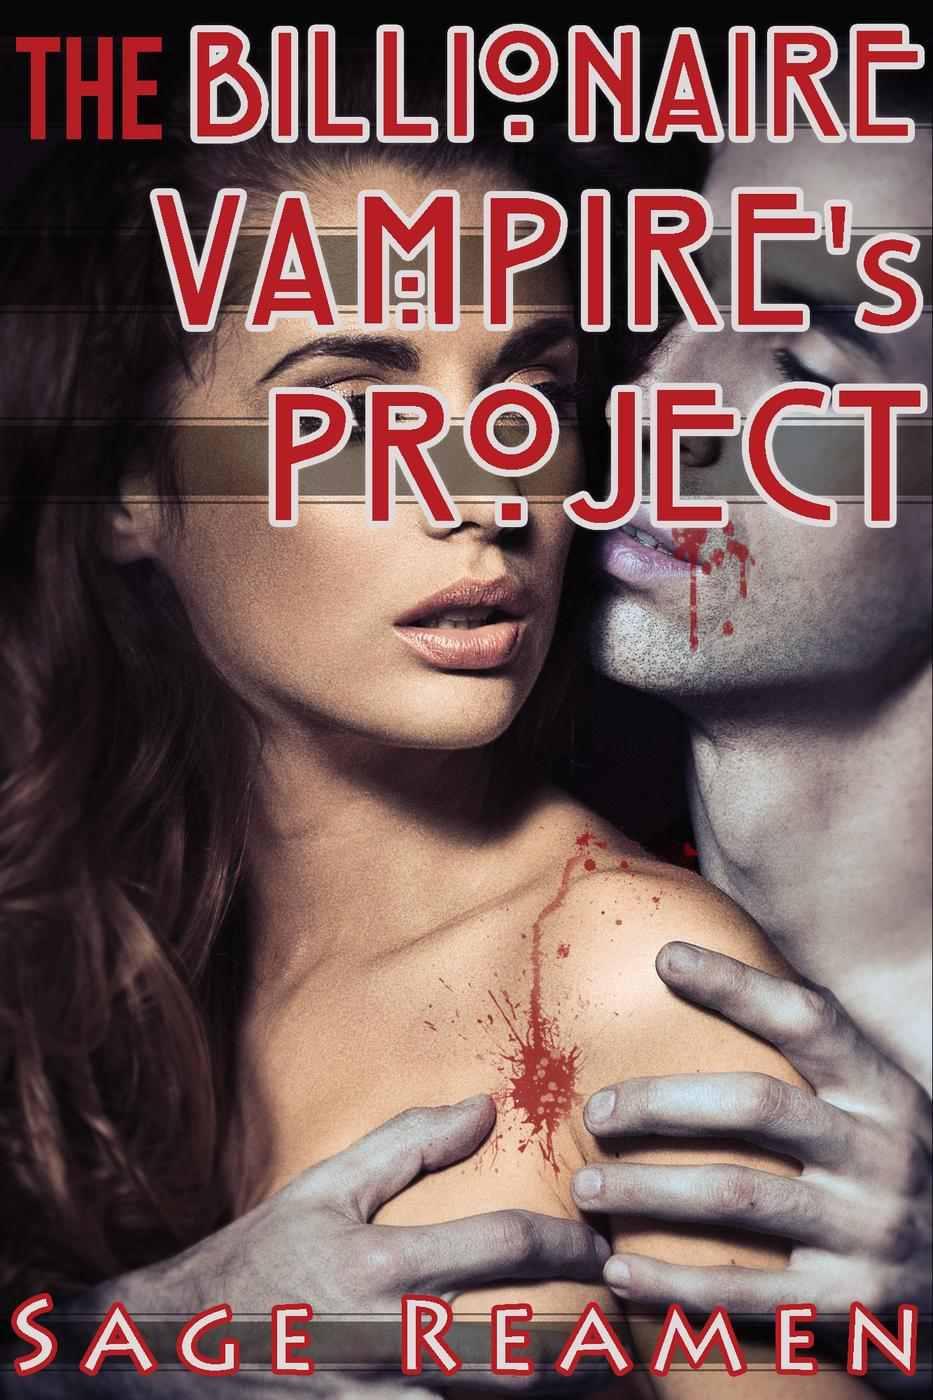 She male vampires sex pic